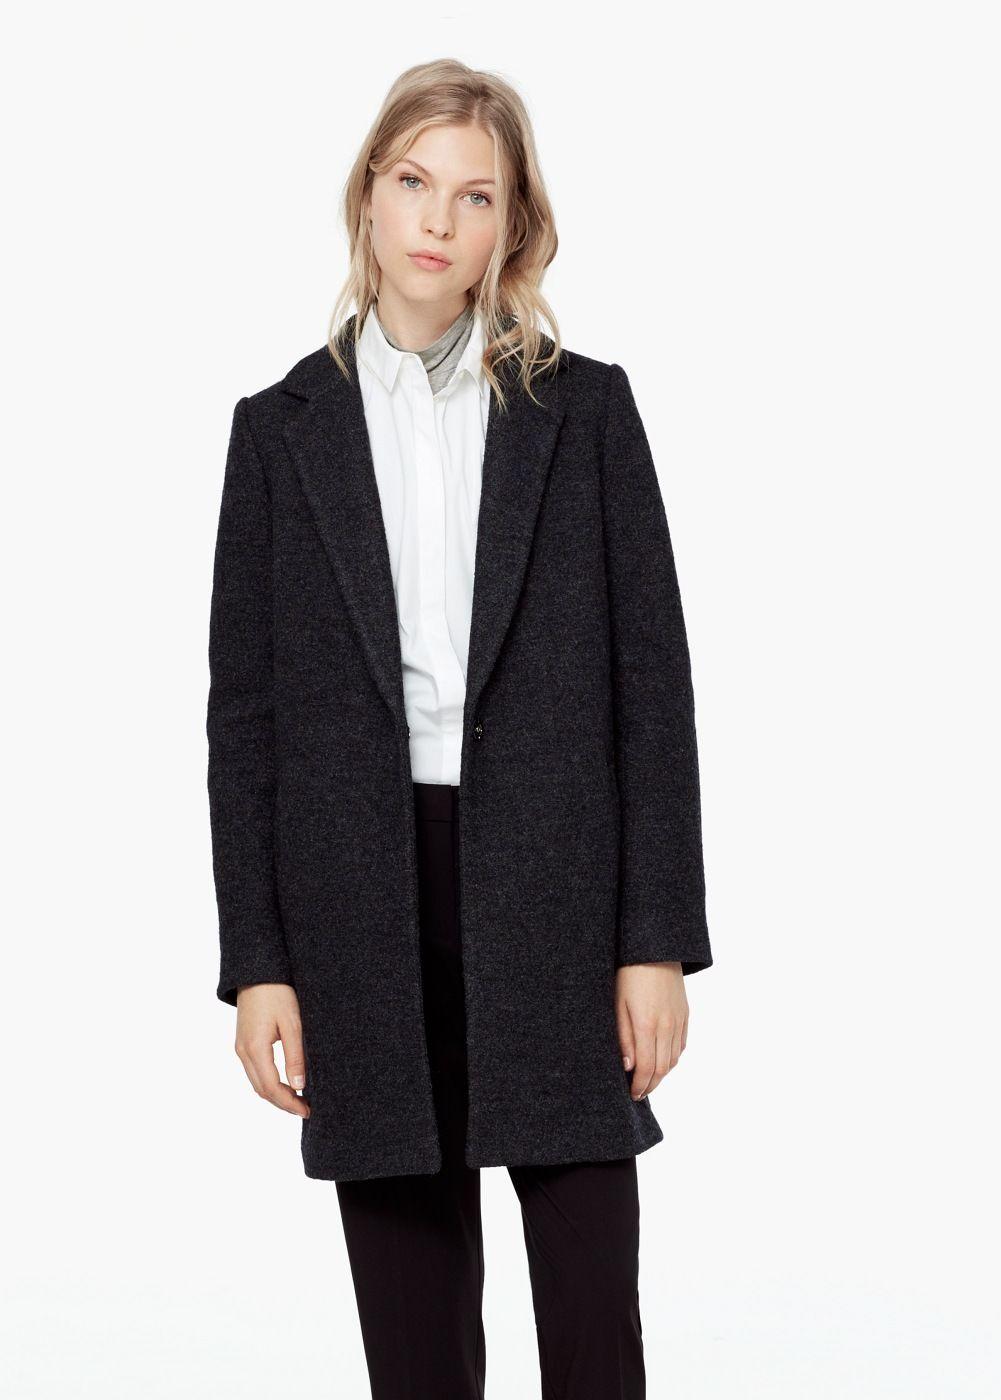 Abrigo bouclé lana Mujer | Coats for women, Wool coat, Clothes